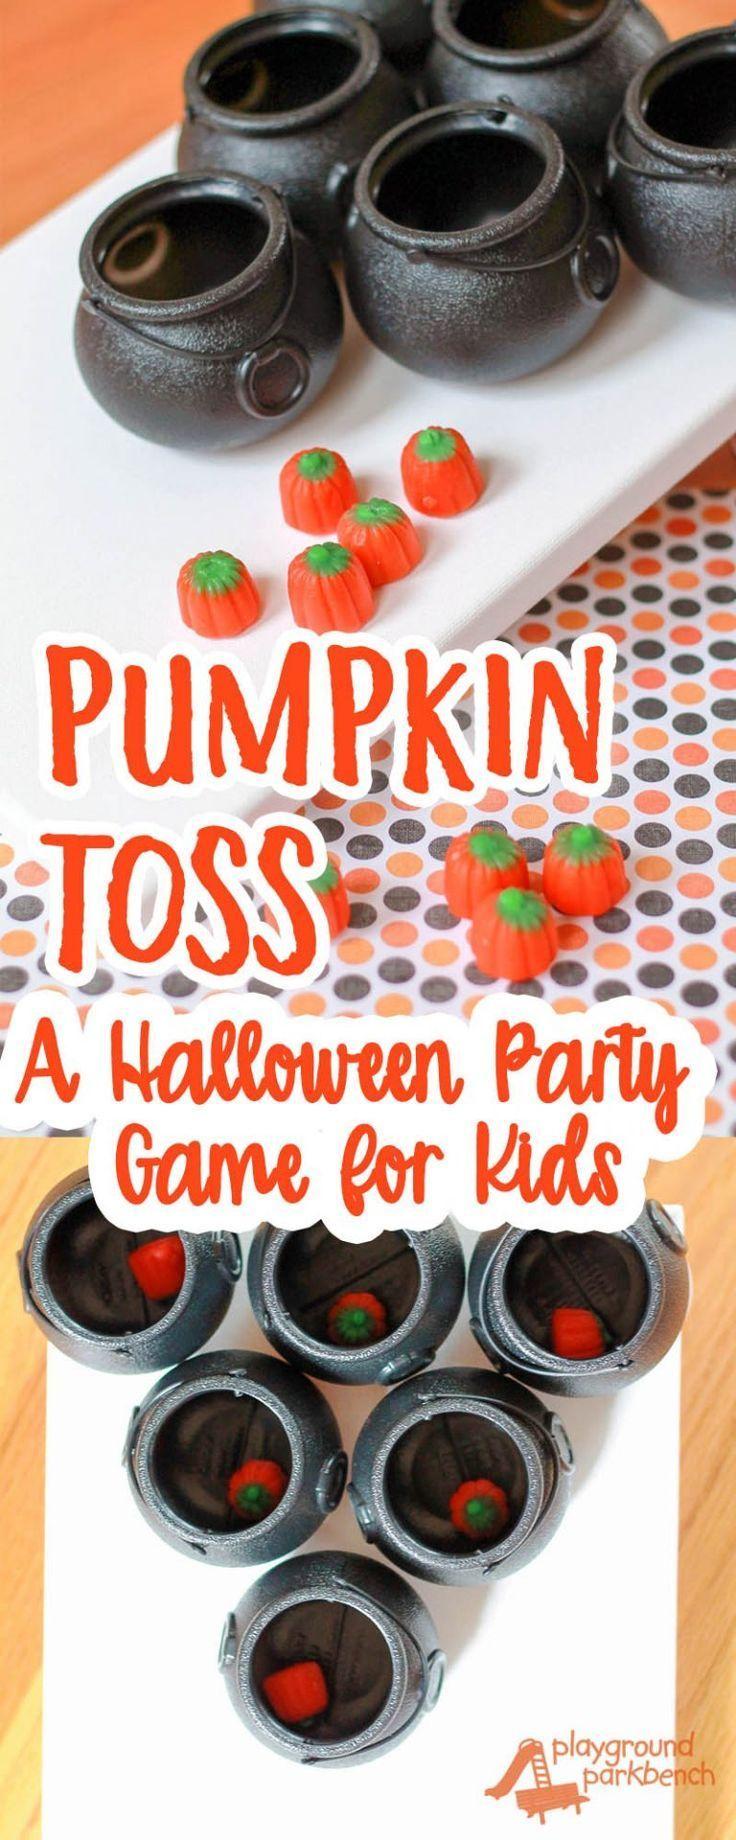 Pumpkin Toss: Simple Party Games for Children